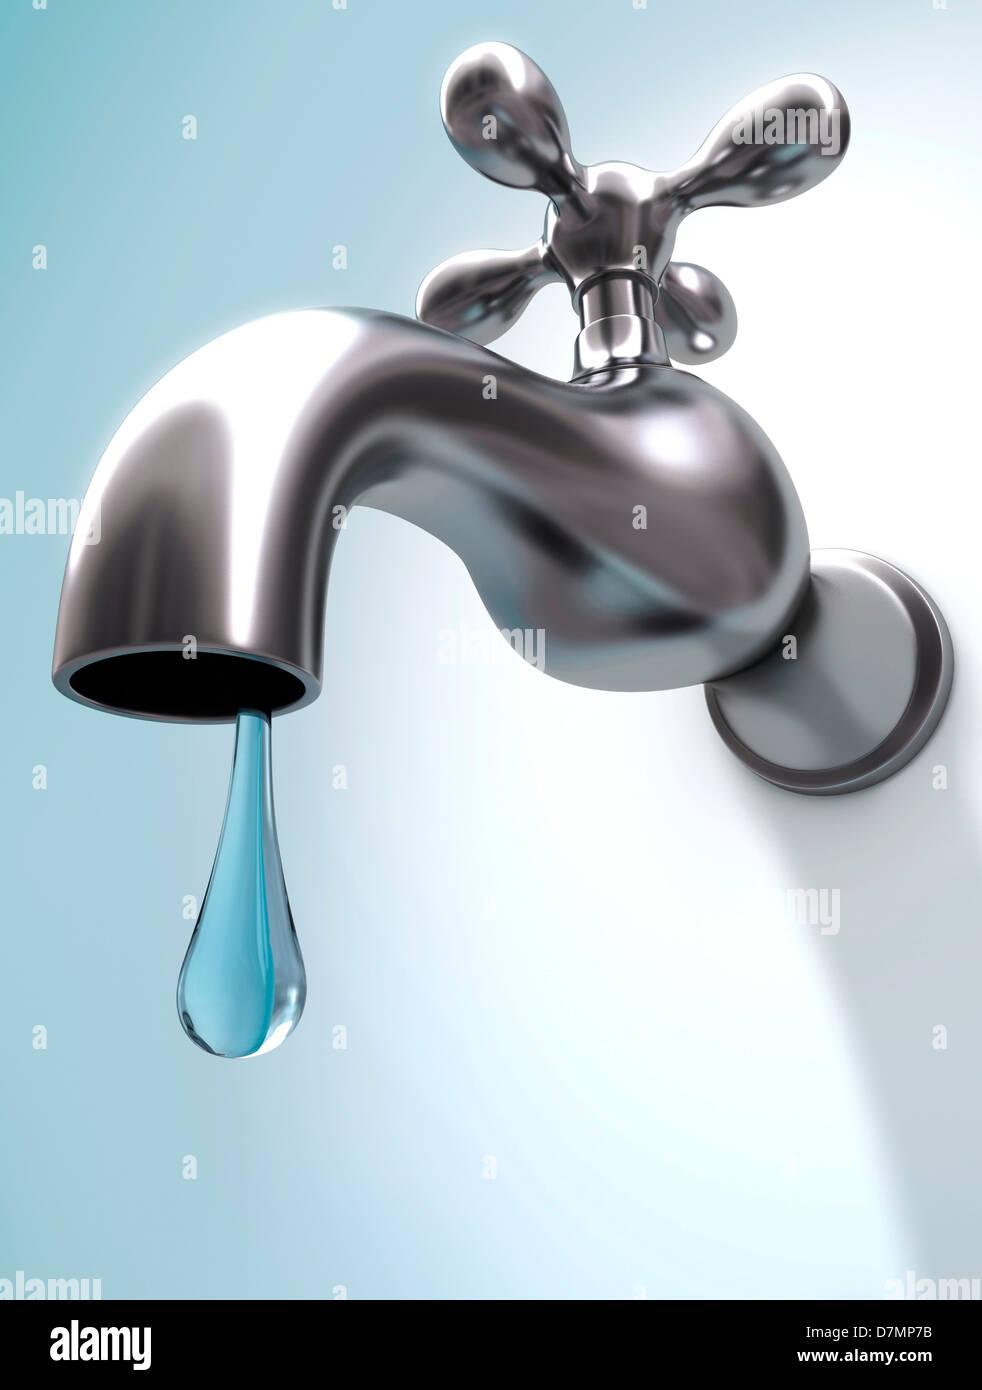 Dripping tap, artwork Stock Photo: 56390191 - Alamy